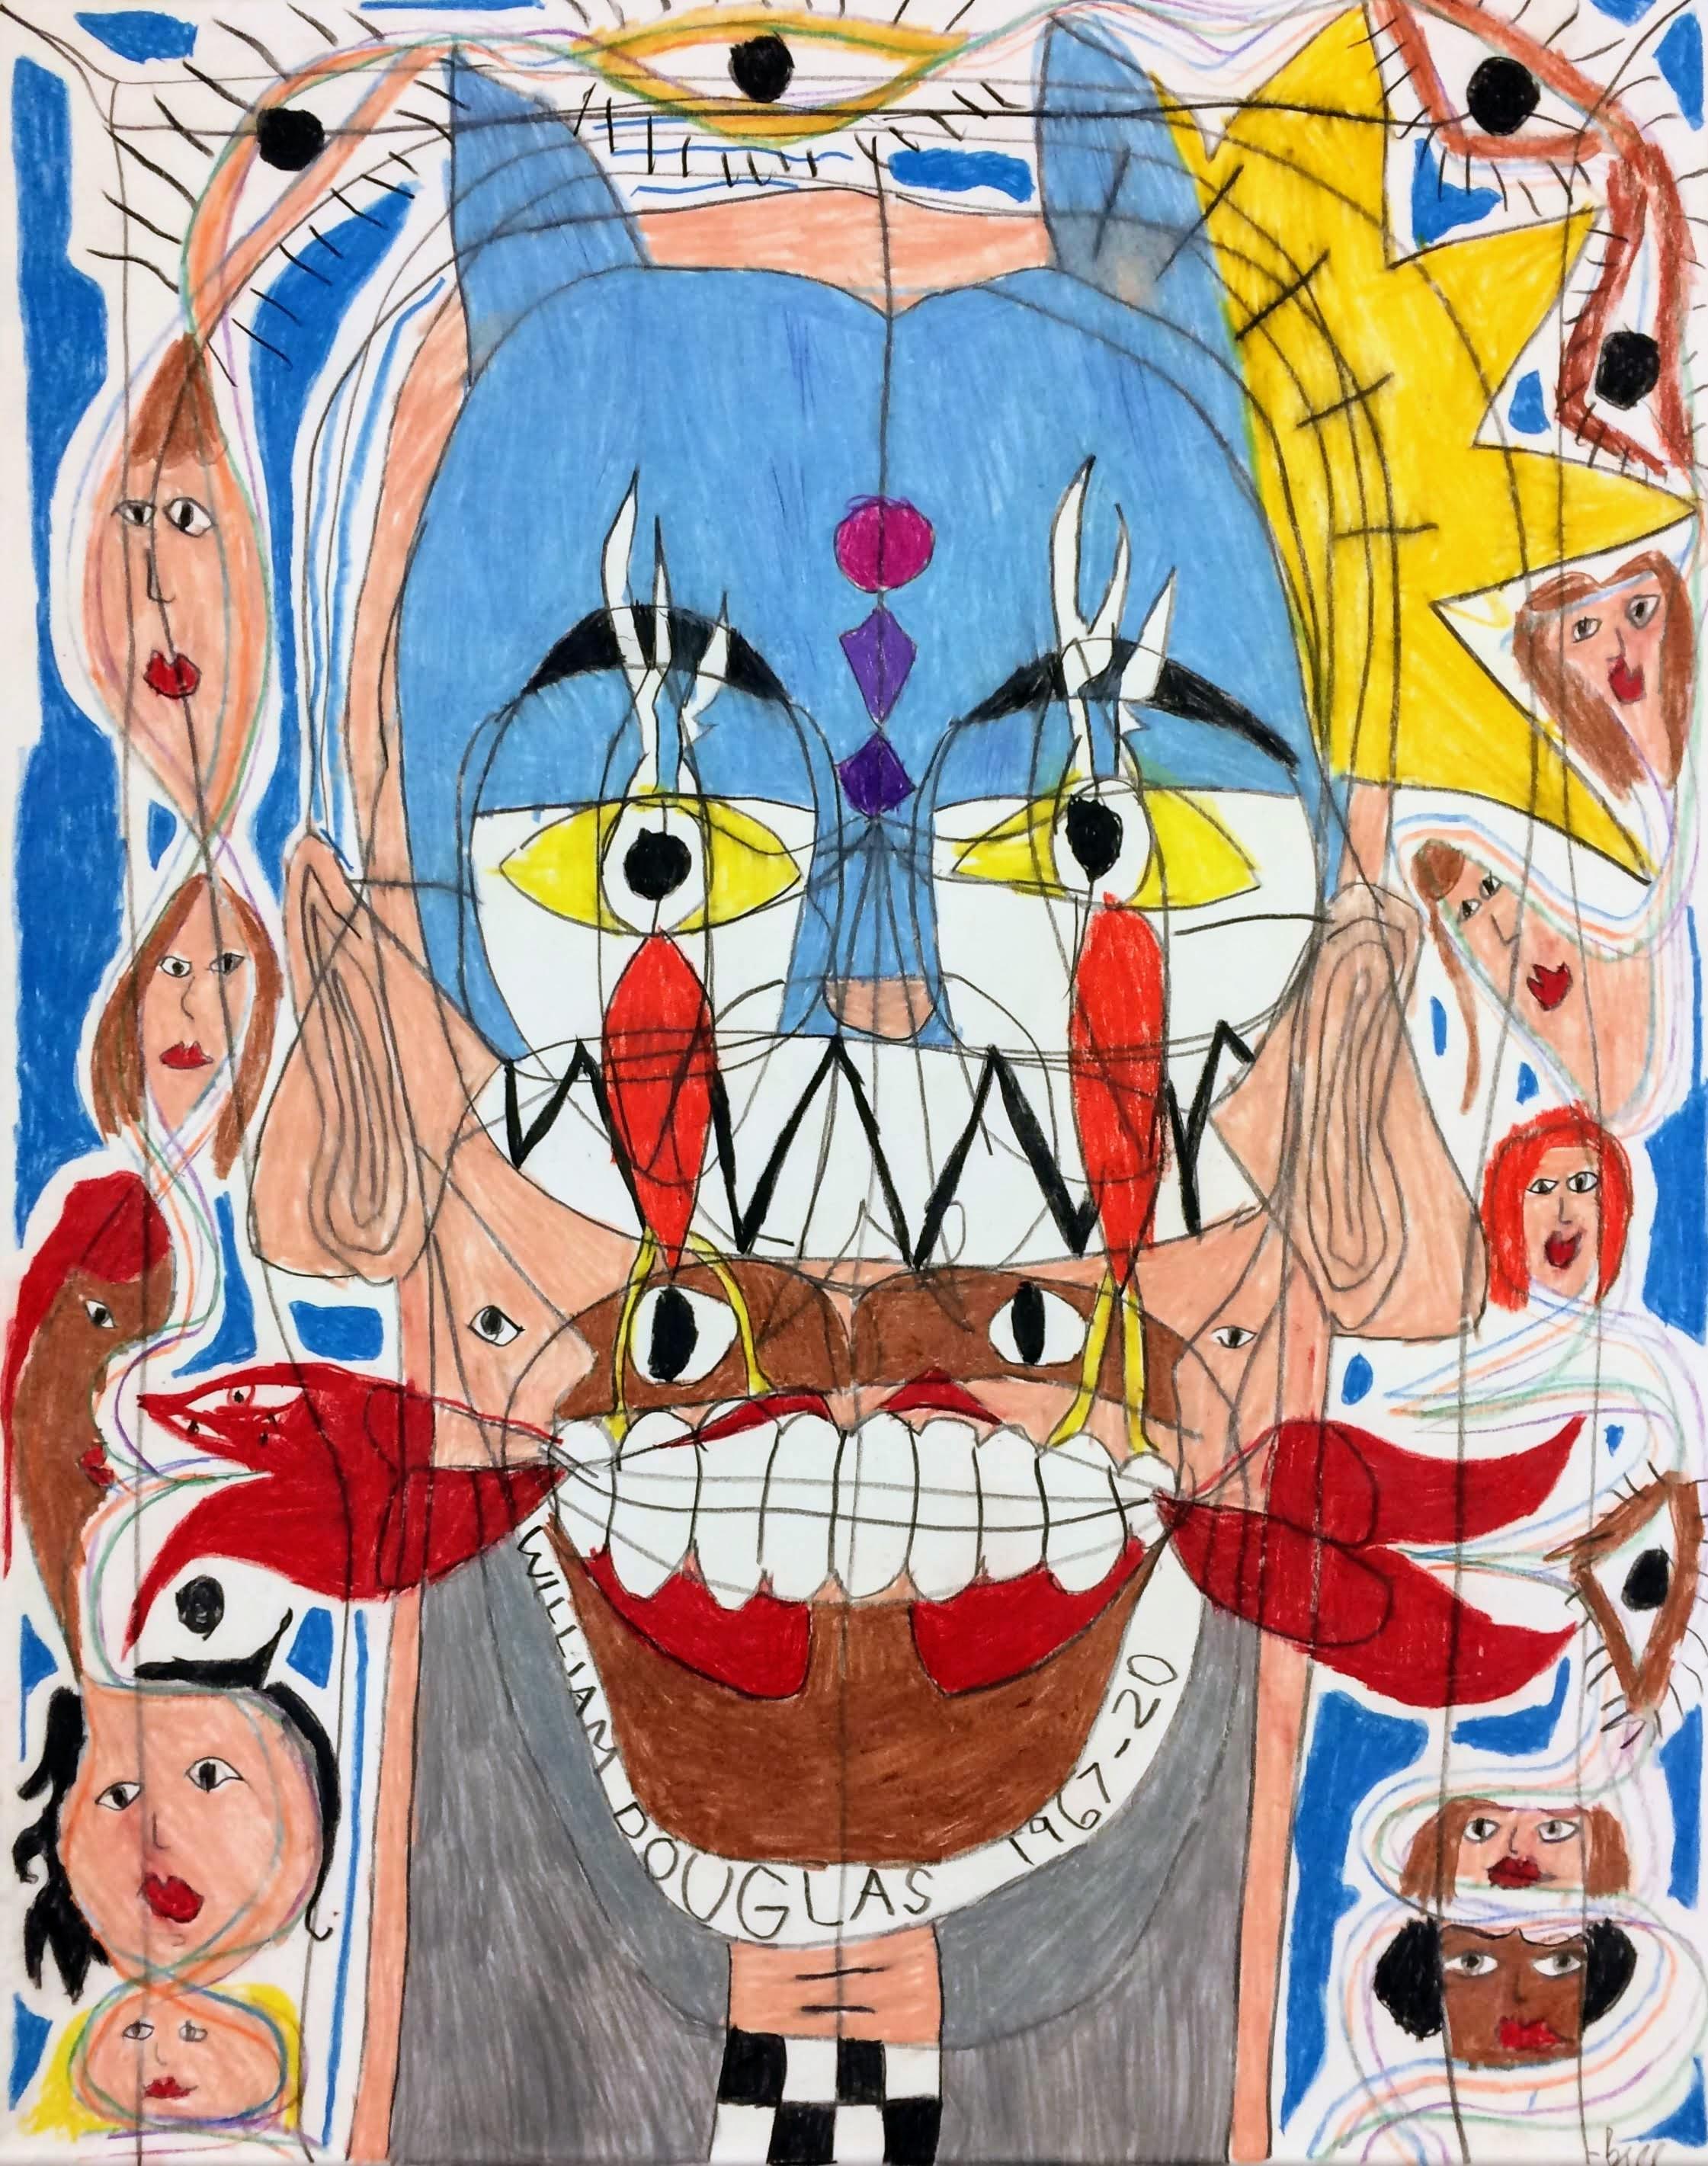 """Exposure"" by Bill Douglas"